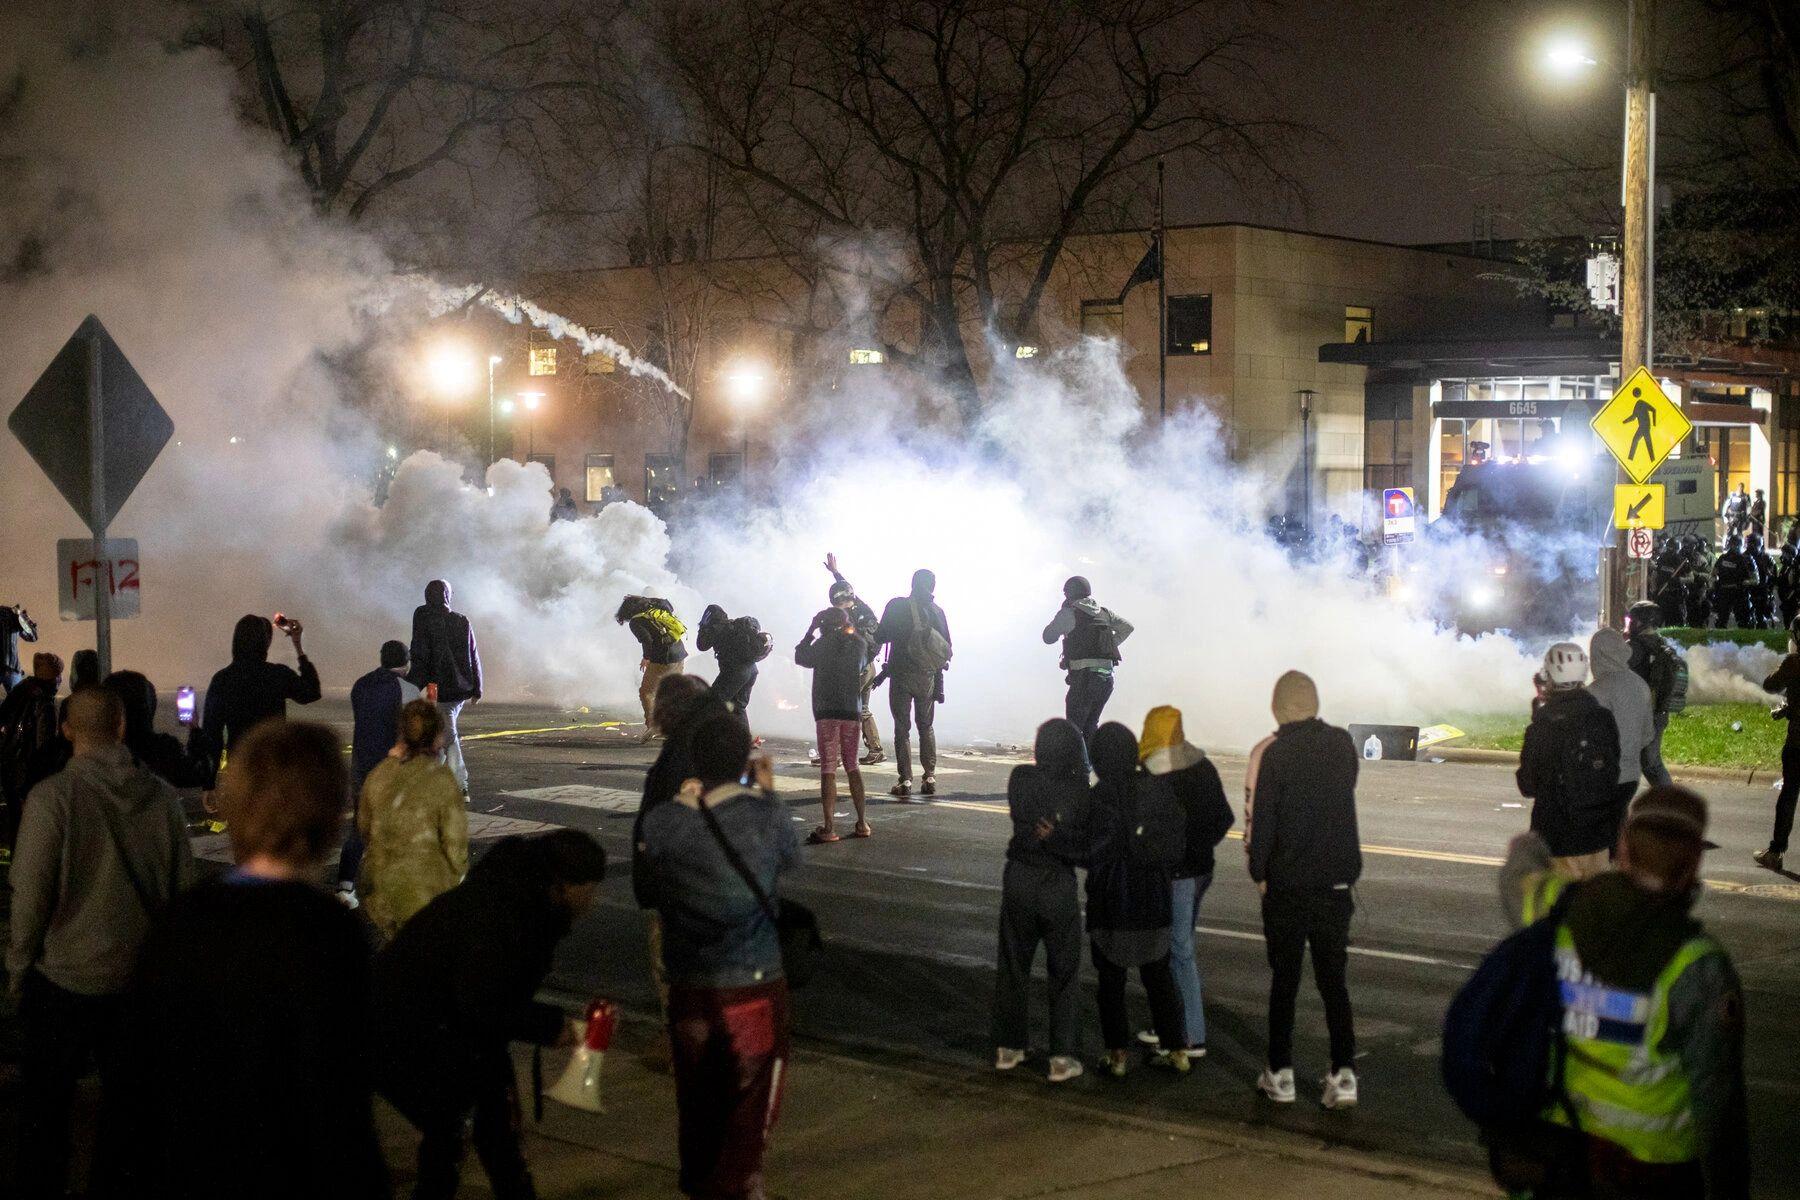 Crowd Protest After Police Near Minneapolis Shot Black Motorist0